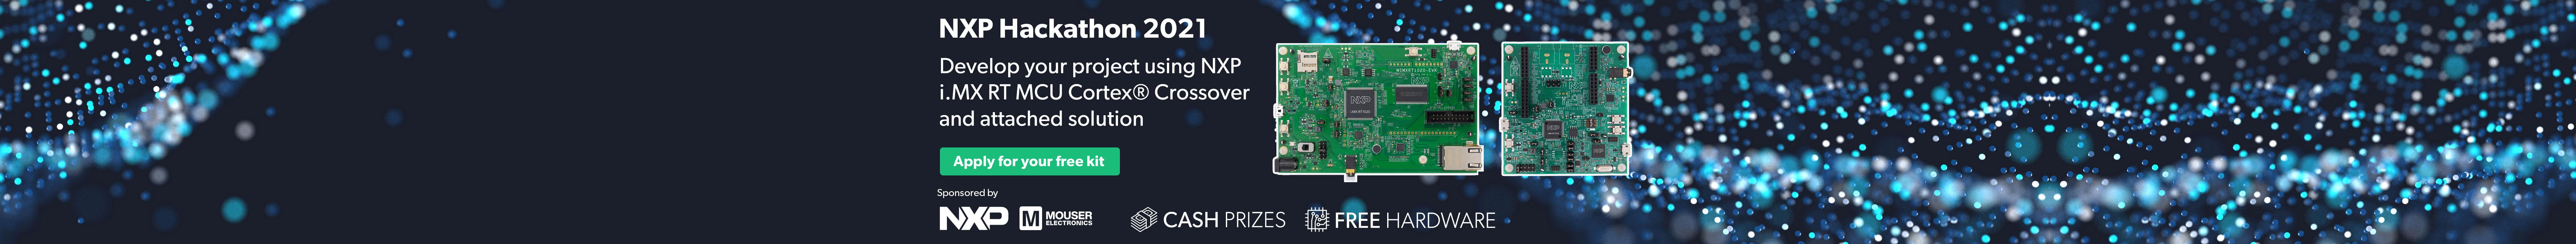 NXP Hackathon 2021